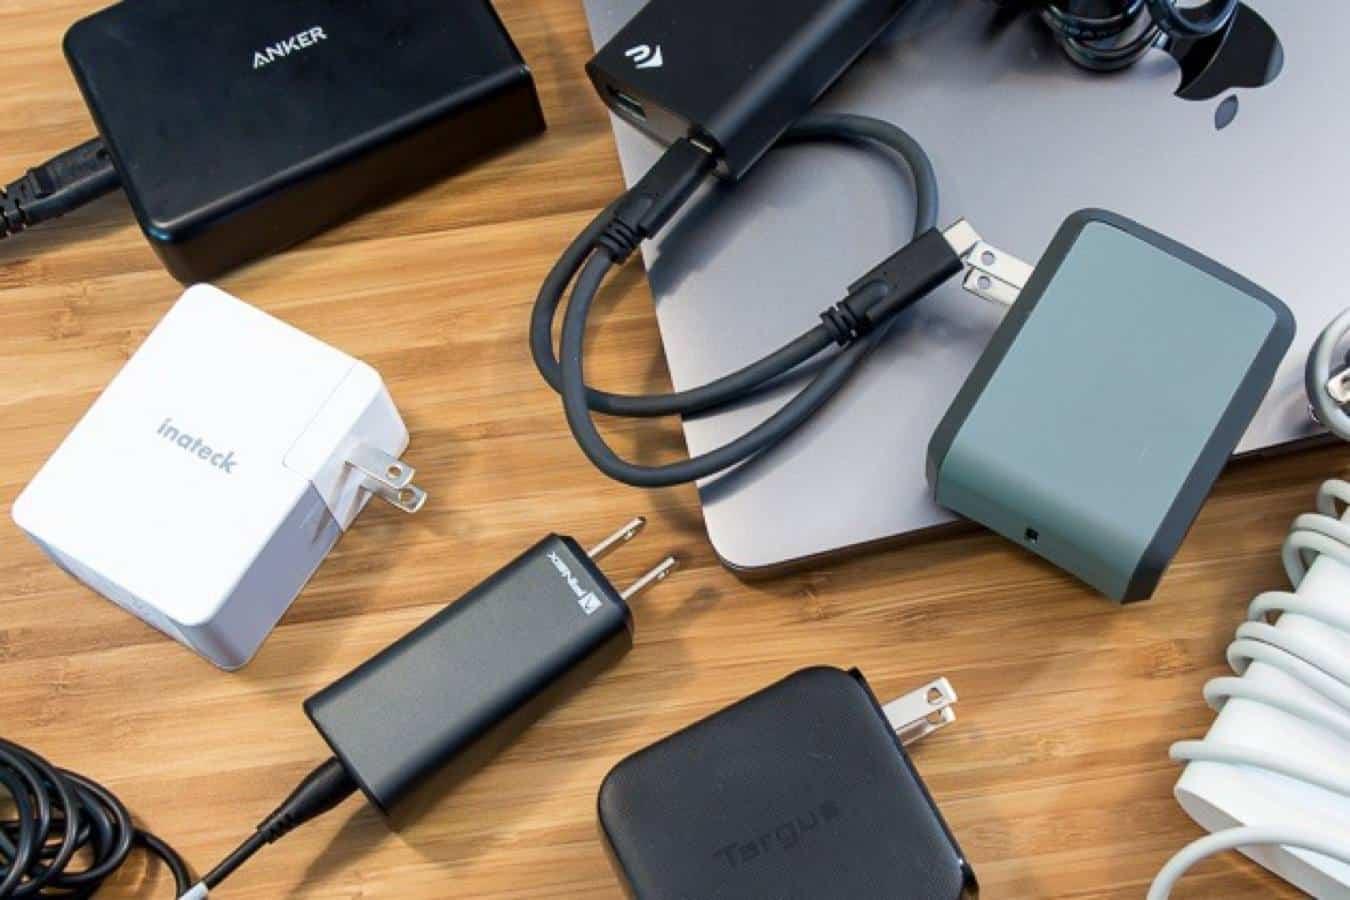 anker charging gear